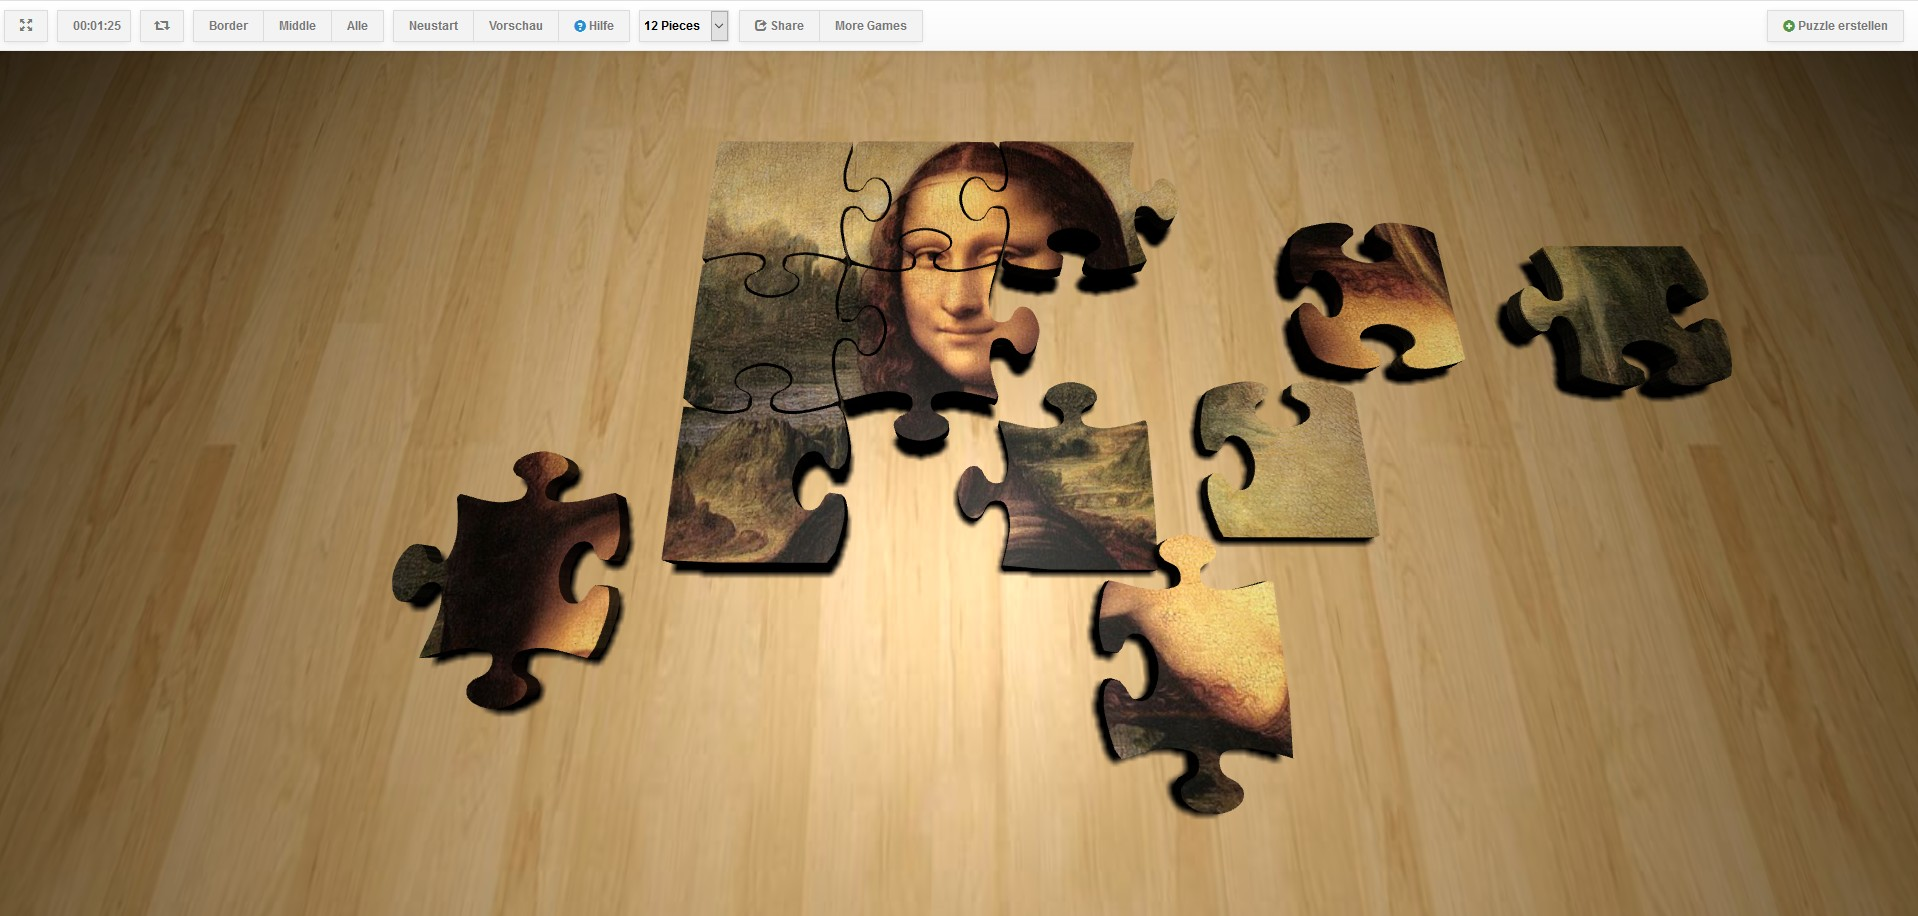 Image 3D Puzzle Creator